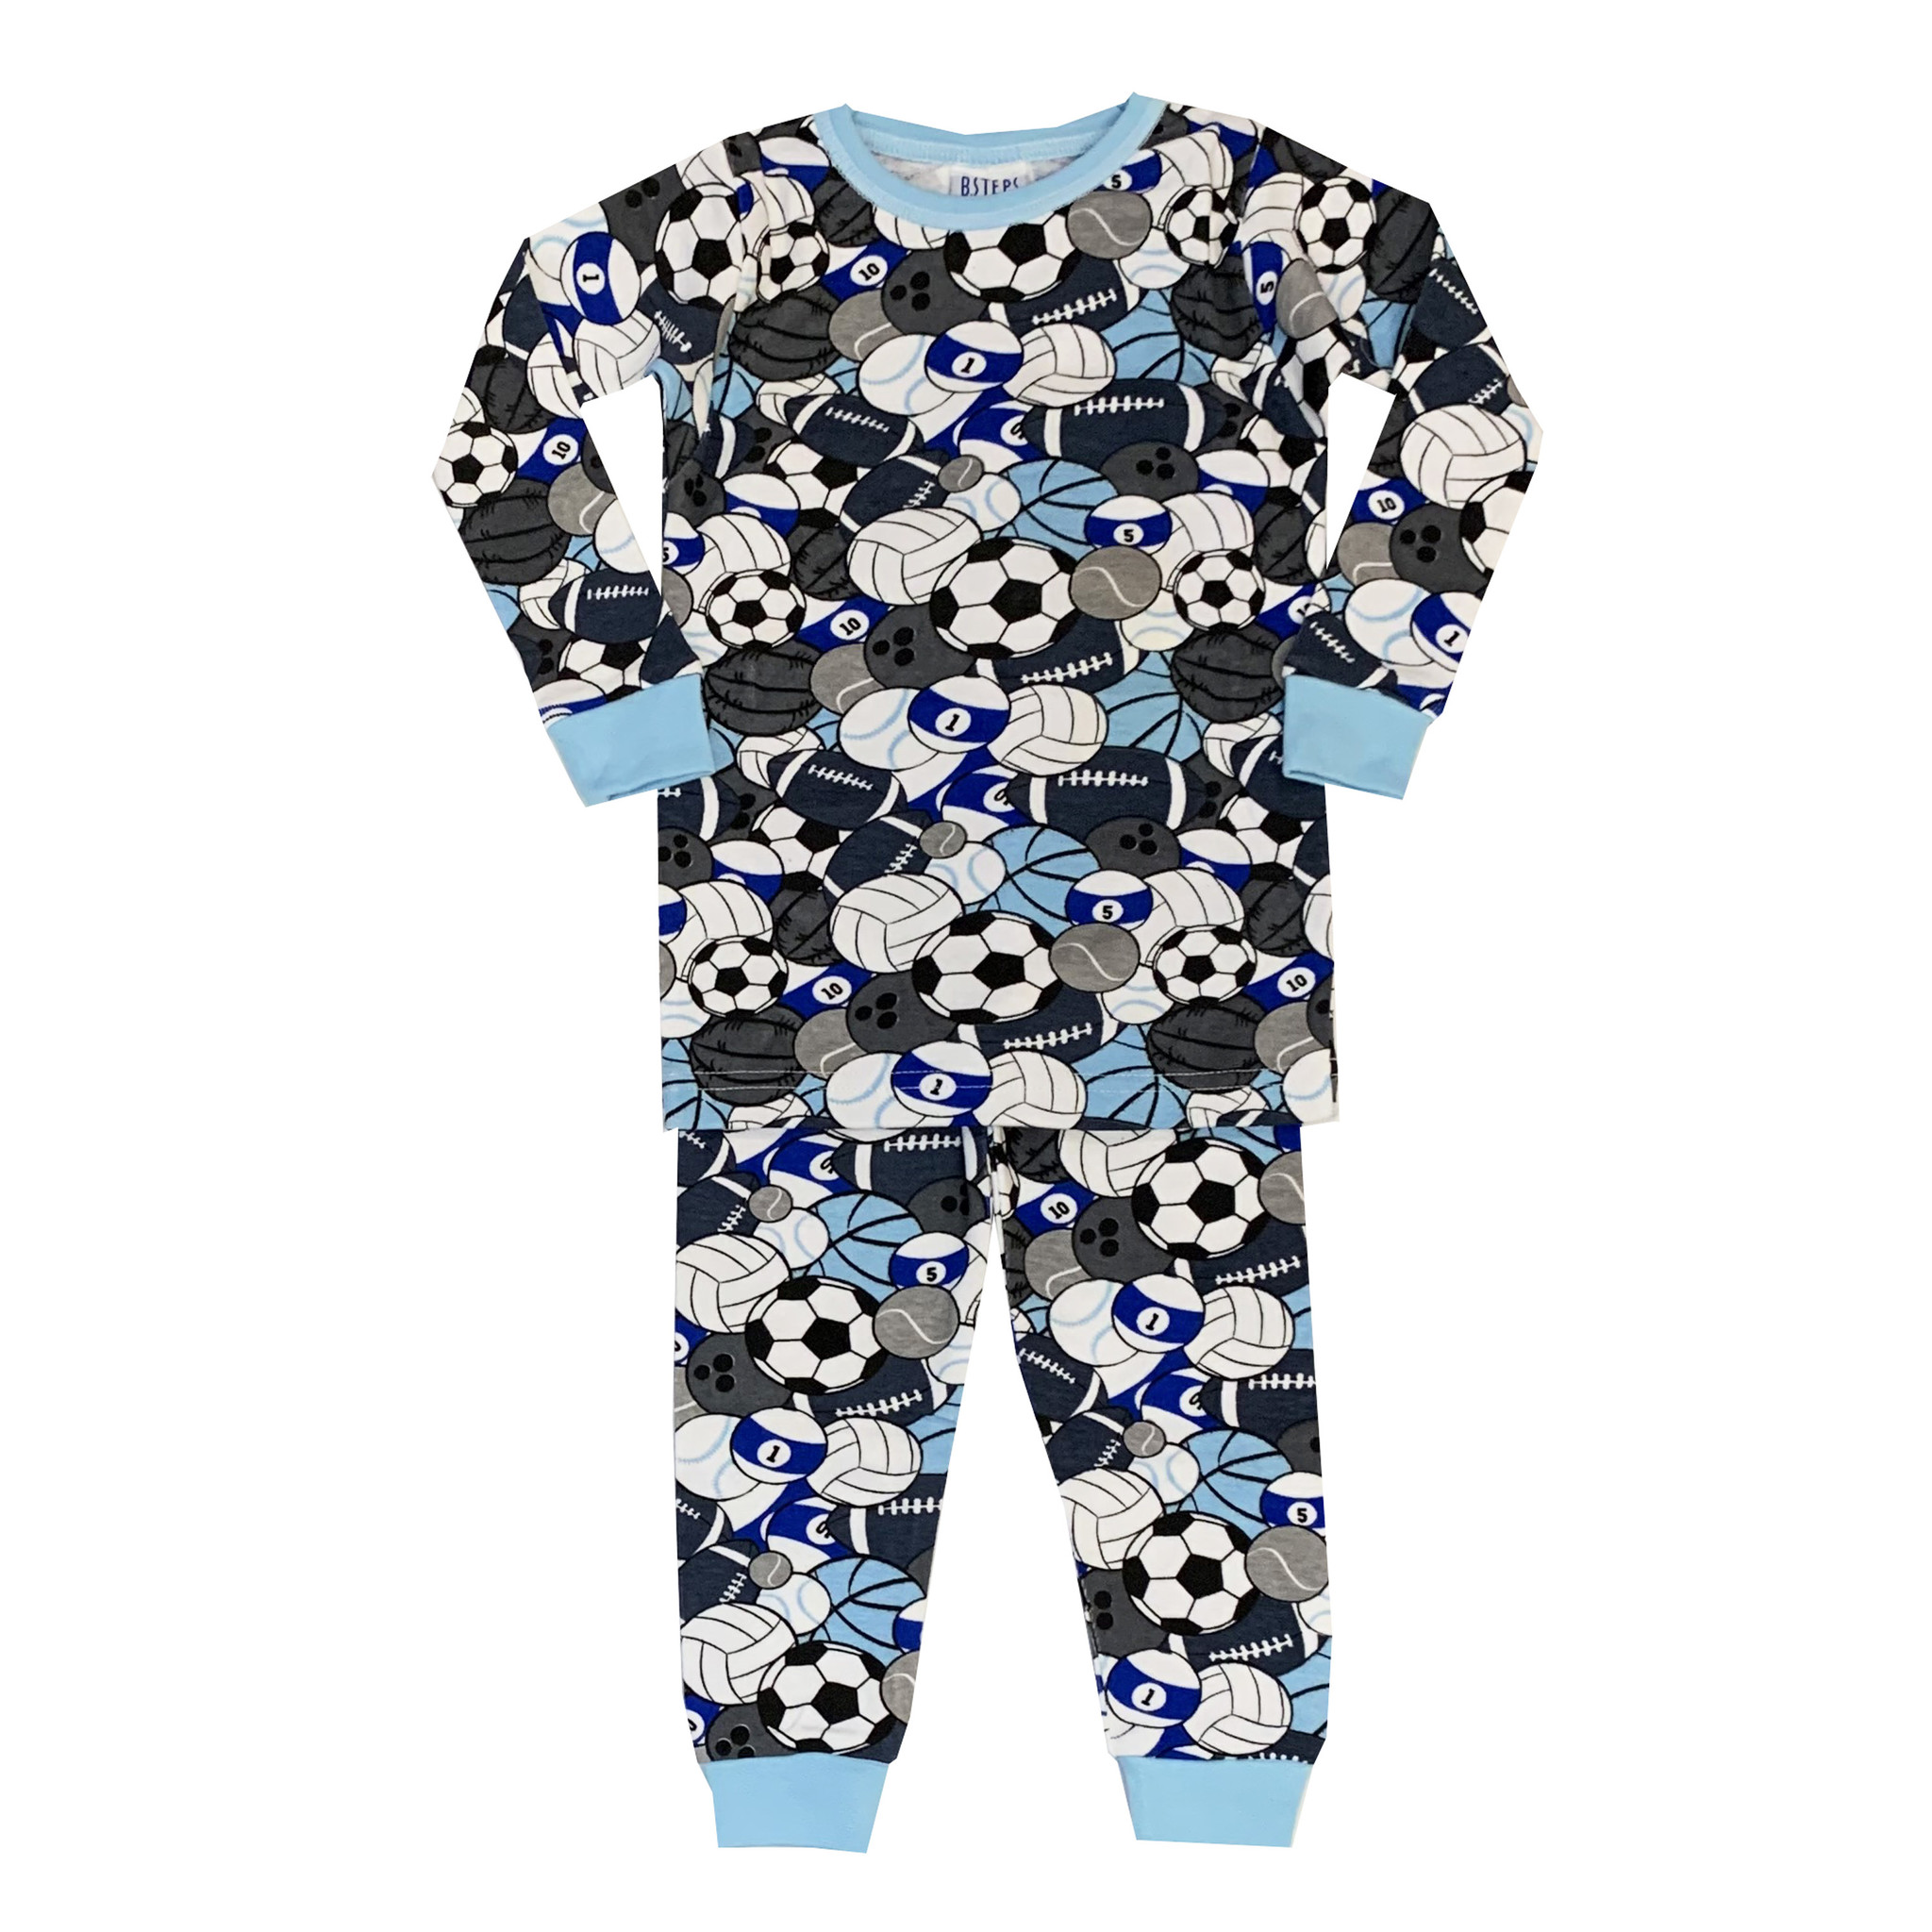 Baby Steps Blue Sports PJ Set